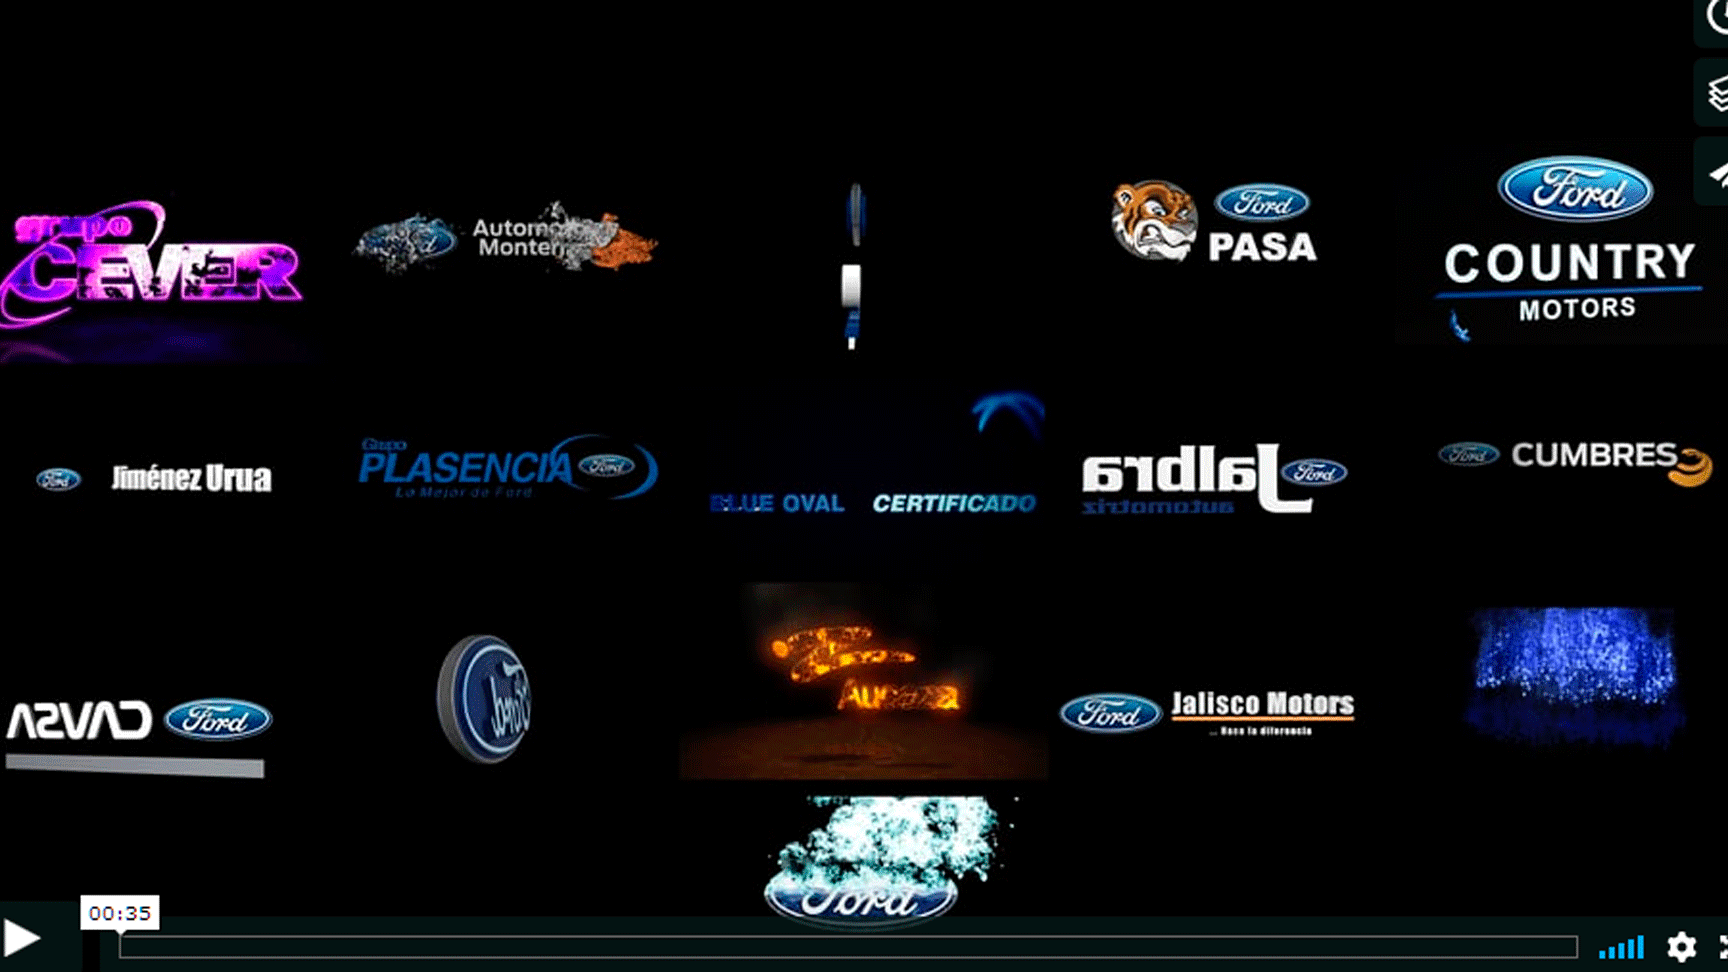 Animación de logotipo